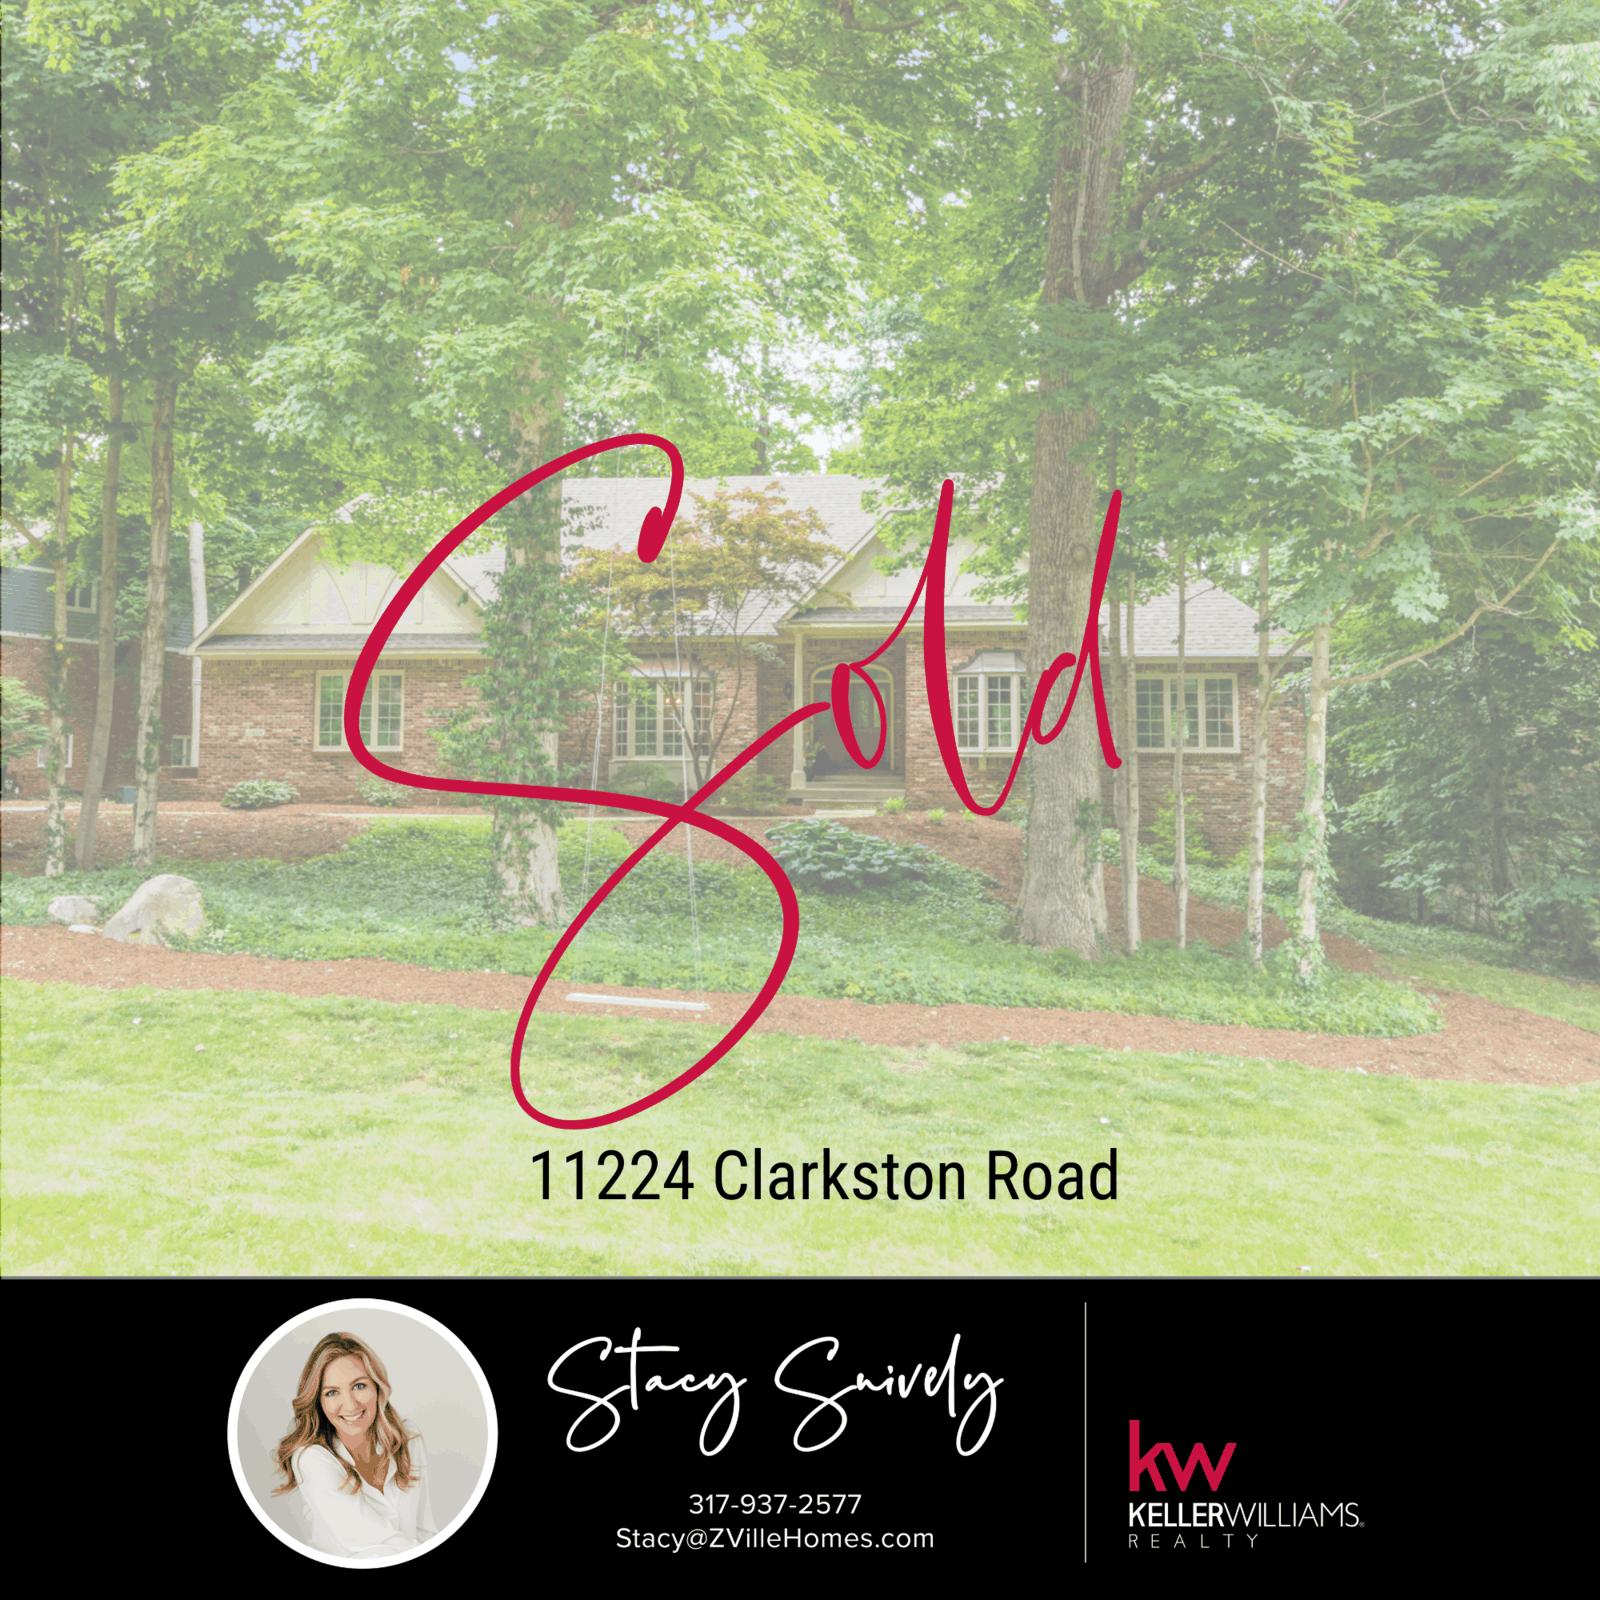 Clarkston Road - sold